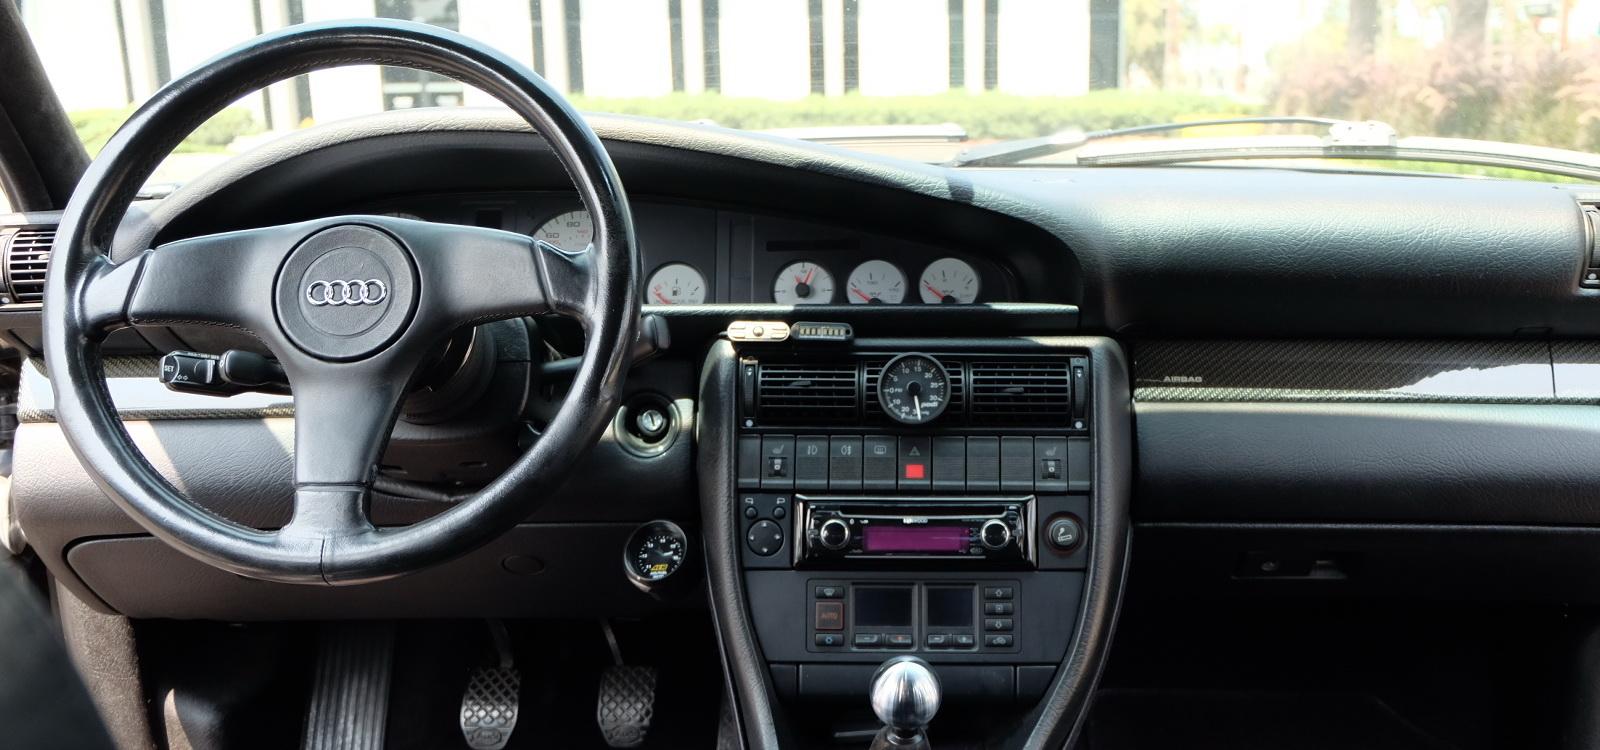 Kekurangan Audi 100 S4 Harga